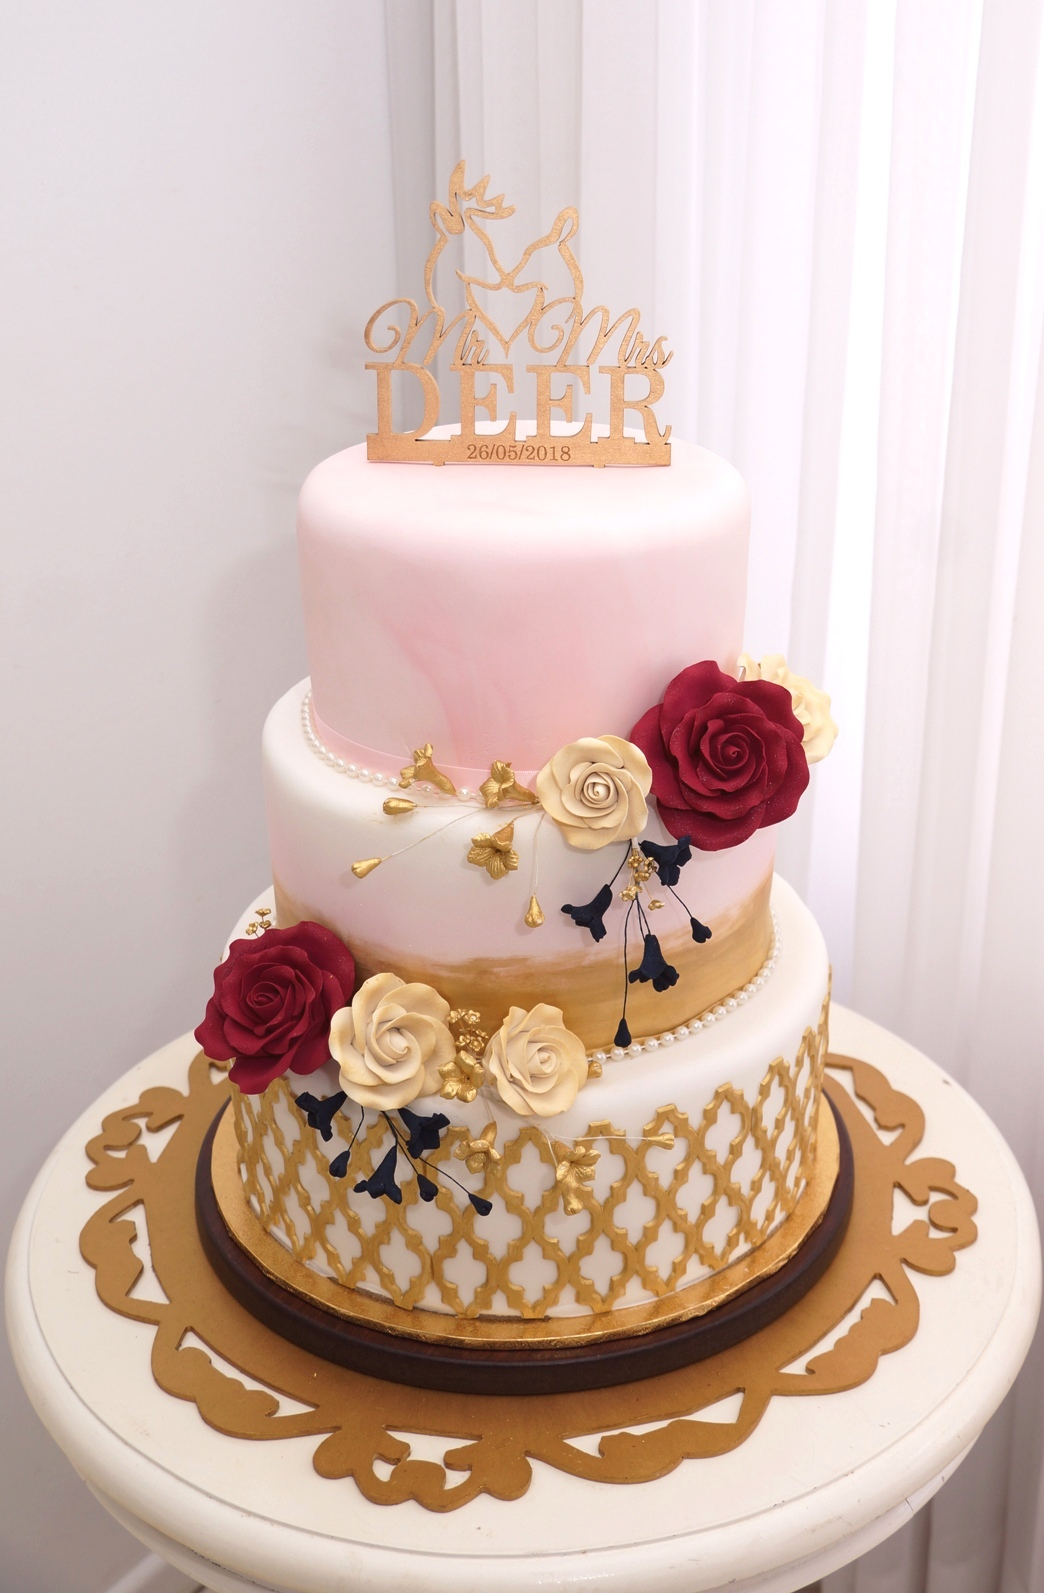 Blush, gold and navy wedding cake 1